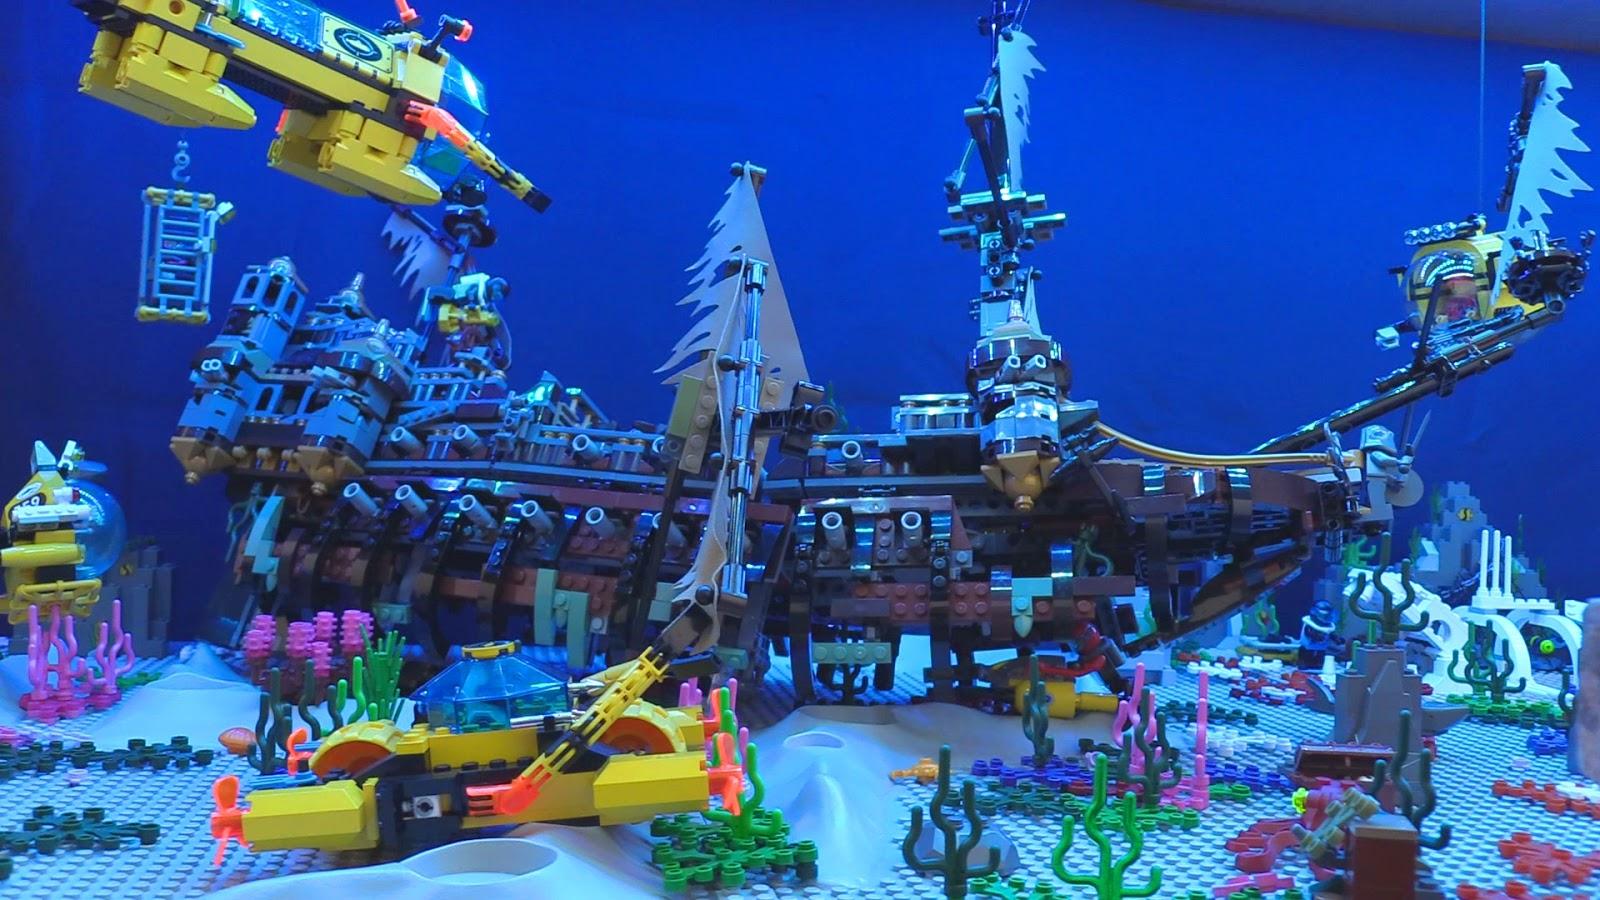 New City Found Under The Sea